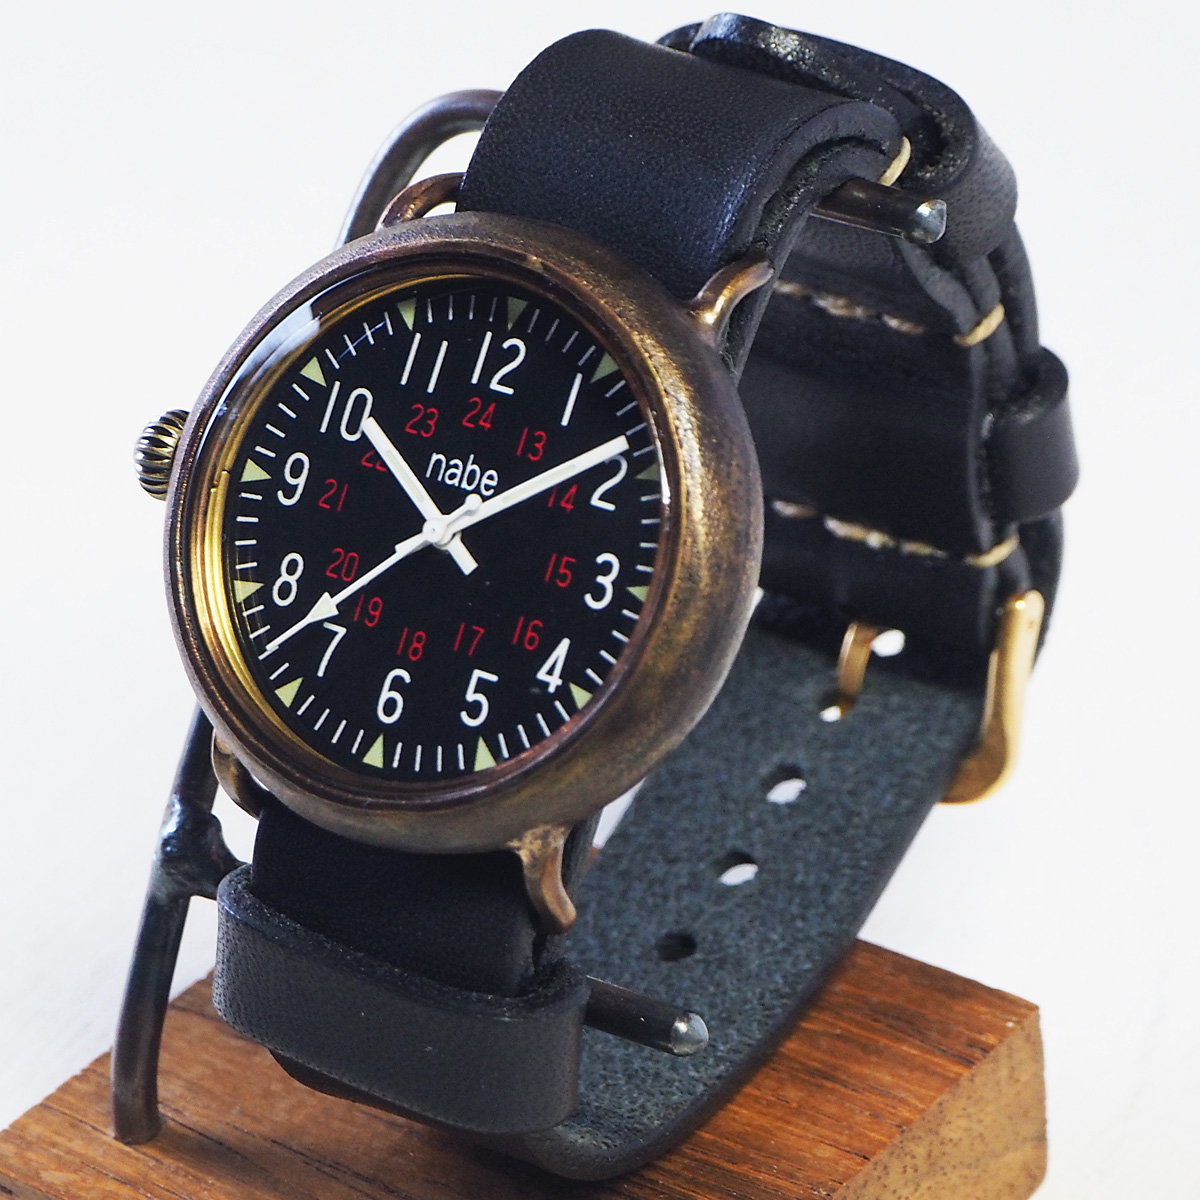 渡辺工房 手作り腕時計